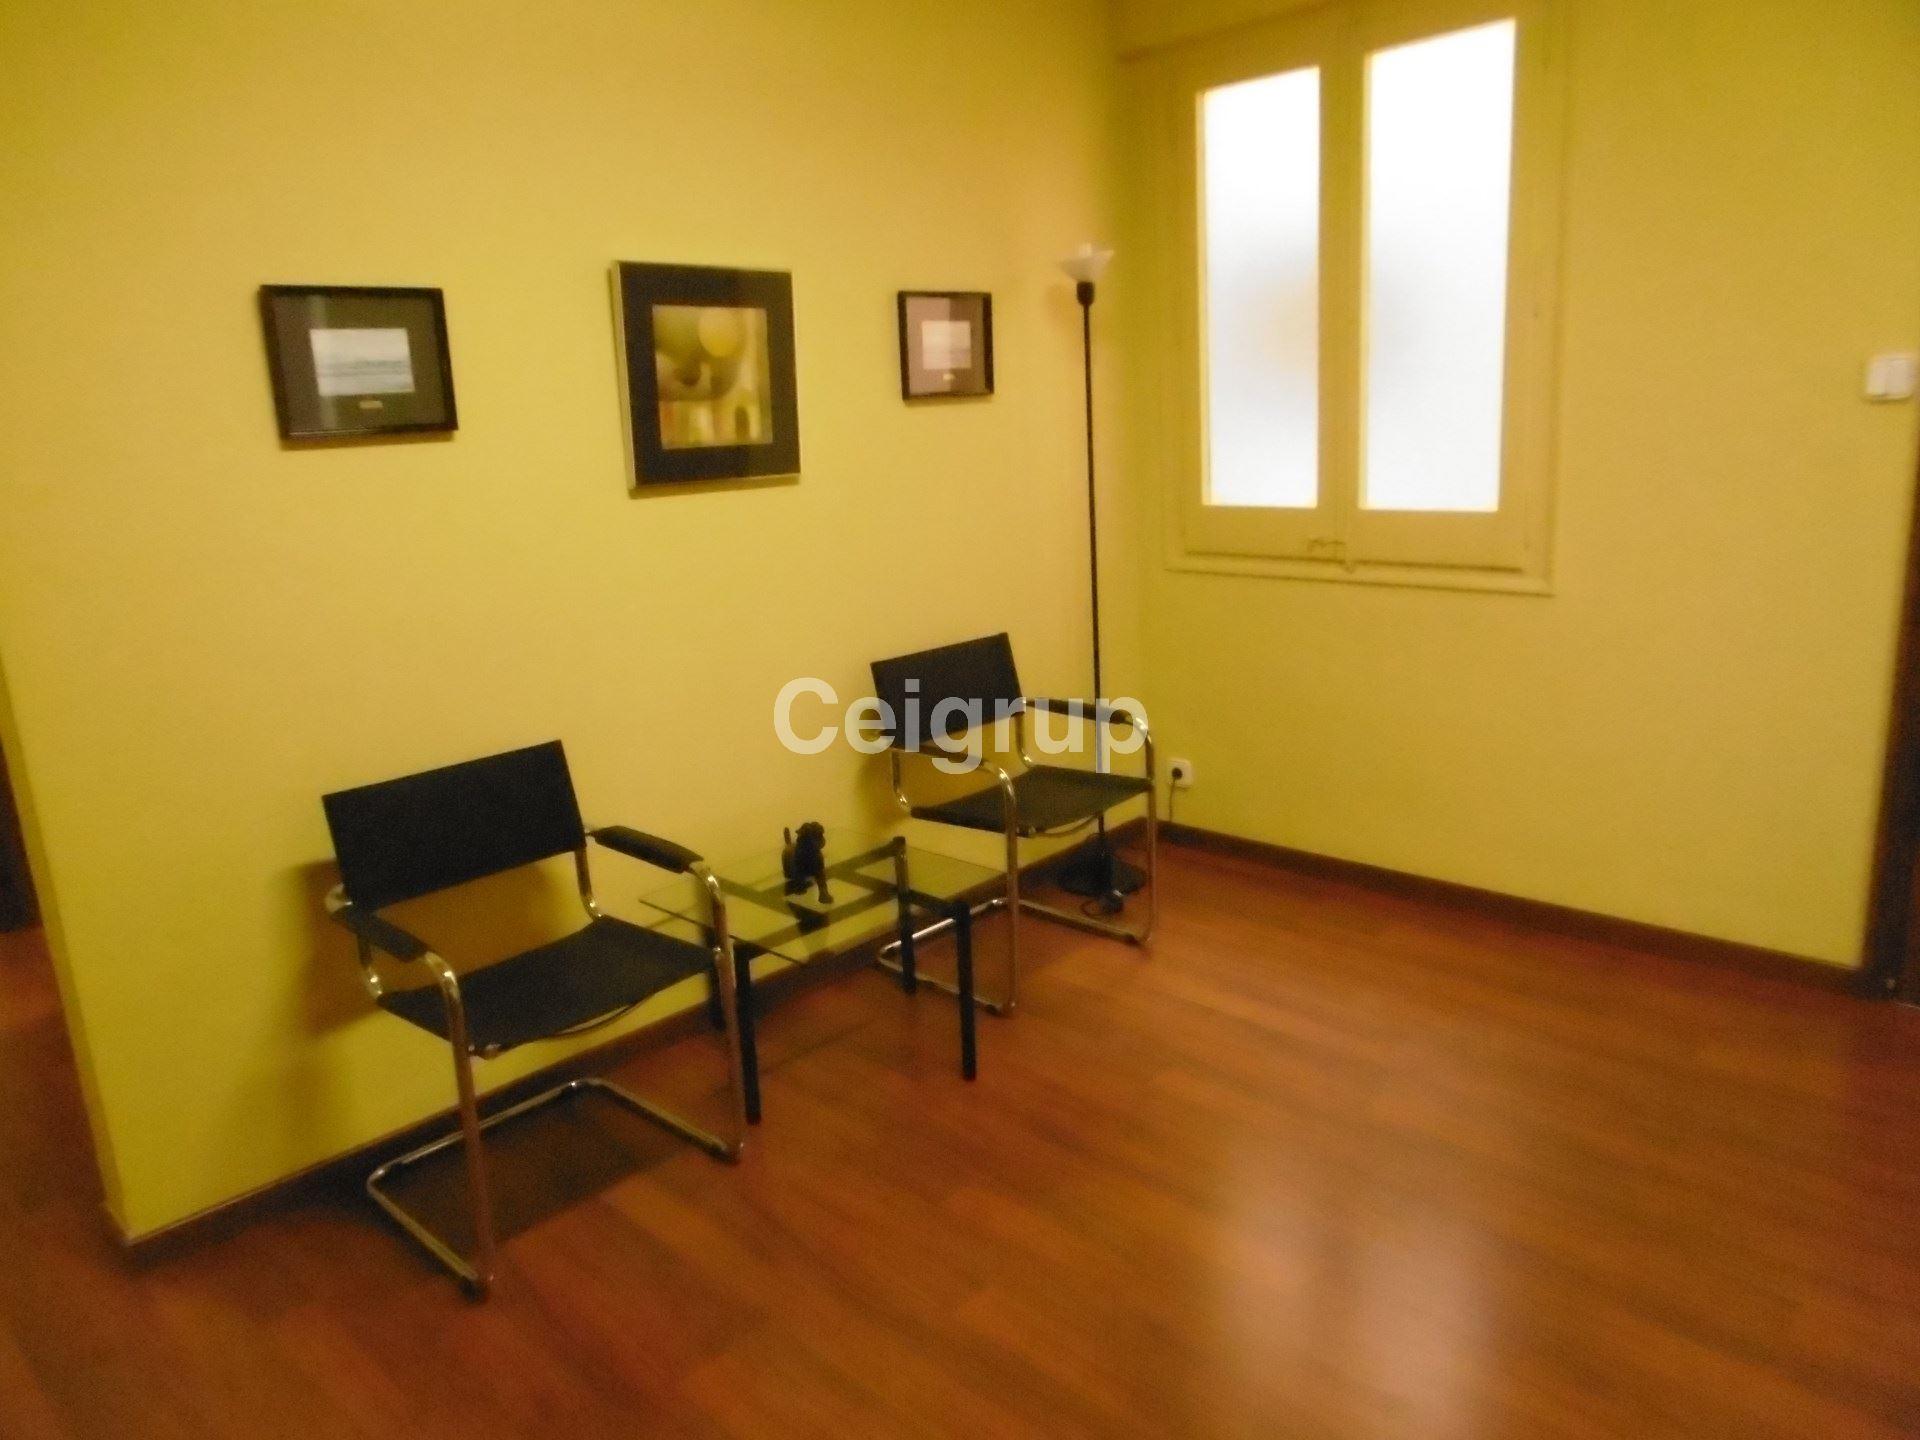 Alquiler oficina despacho figueres ceigrup inmobiliaries for Oficina de turisme figueres